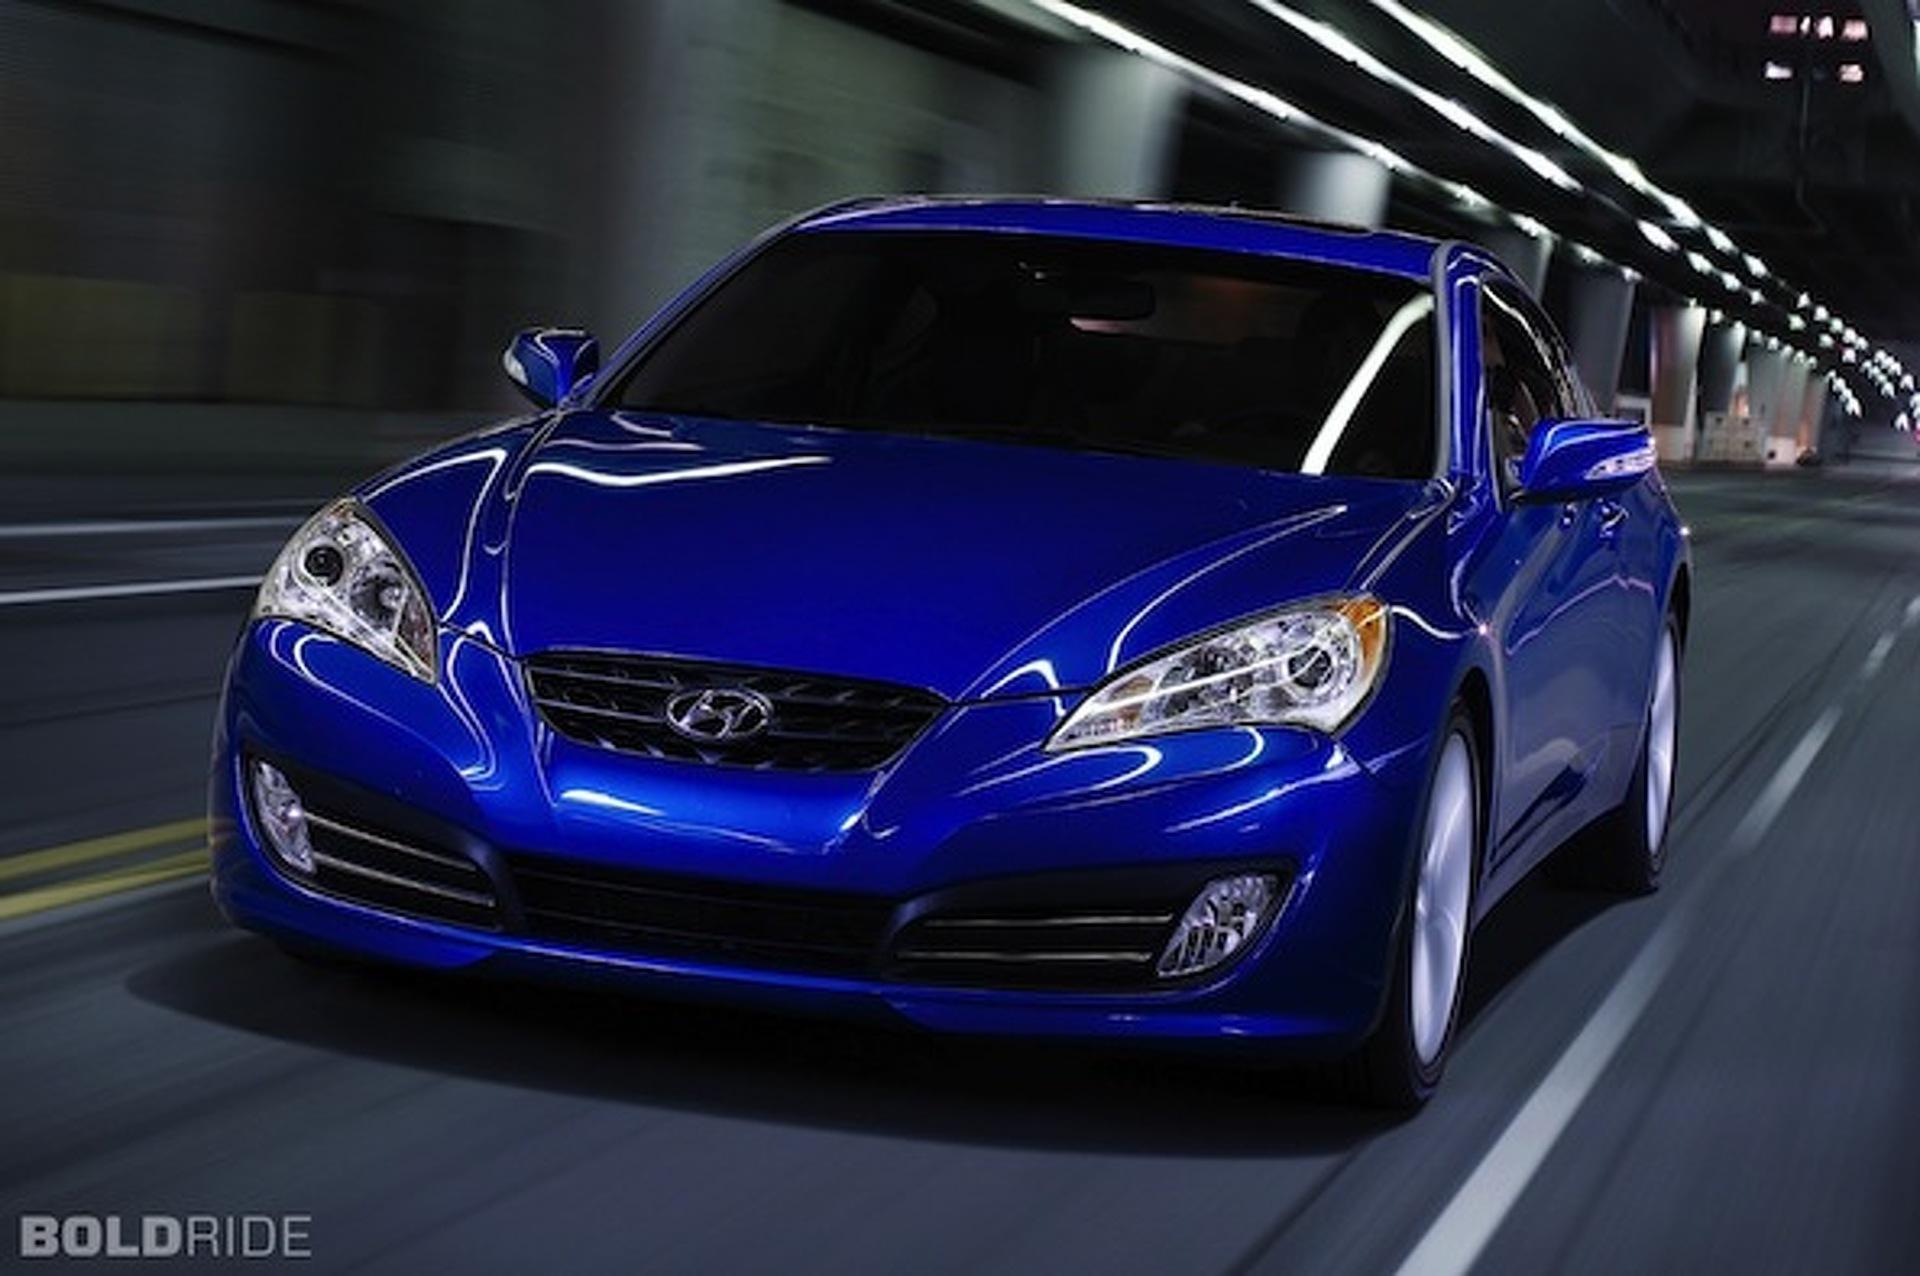 Where Oh Where Has The Hyundai Genesis Gone?